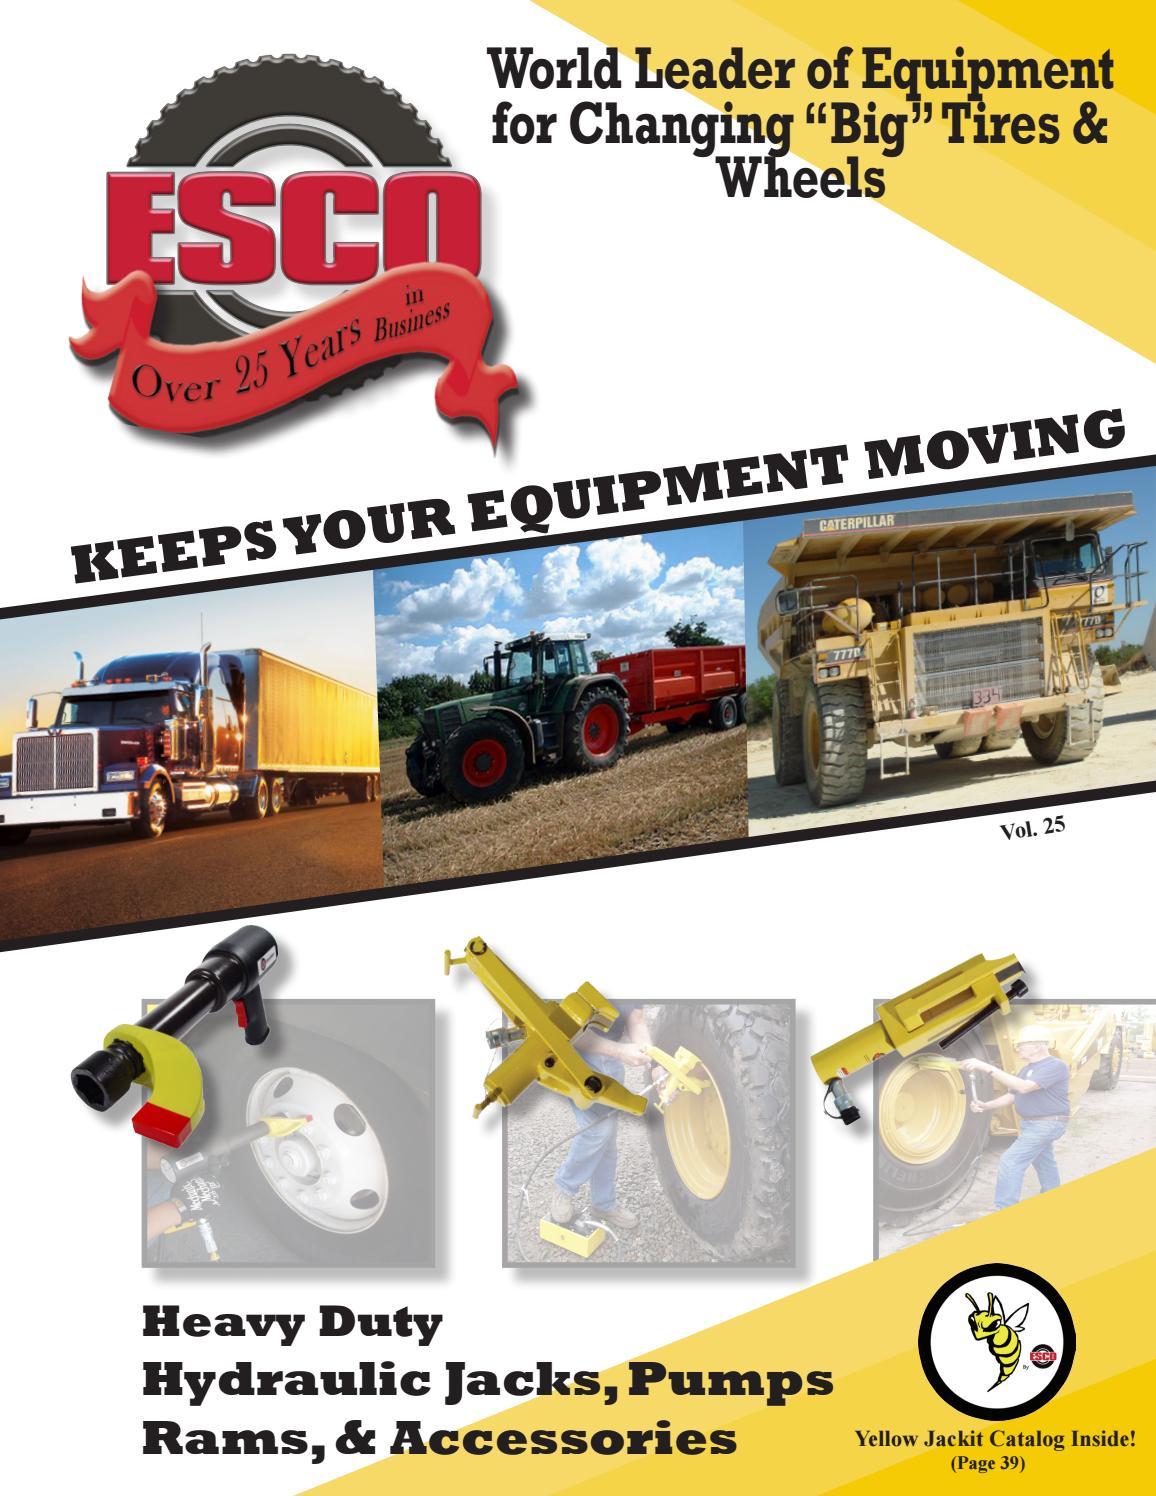 Esco Equipment 30100 Rethread Kit Save-A-Stud